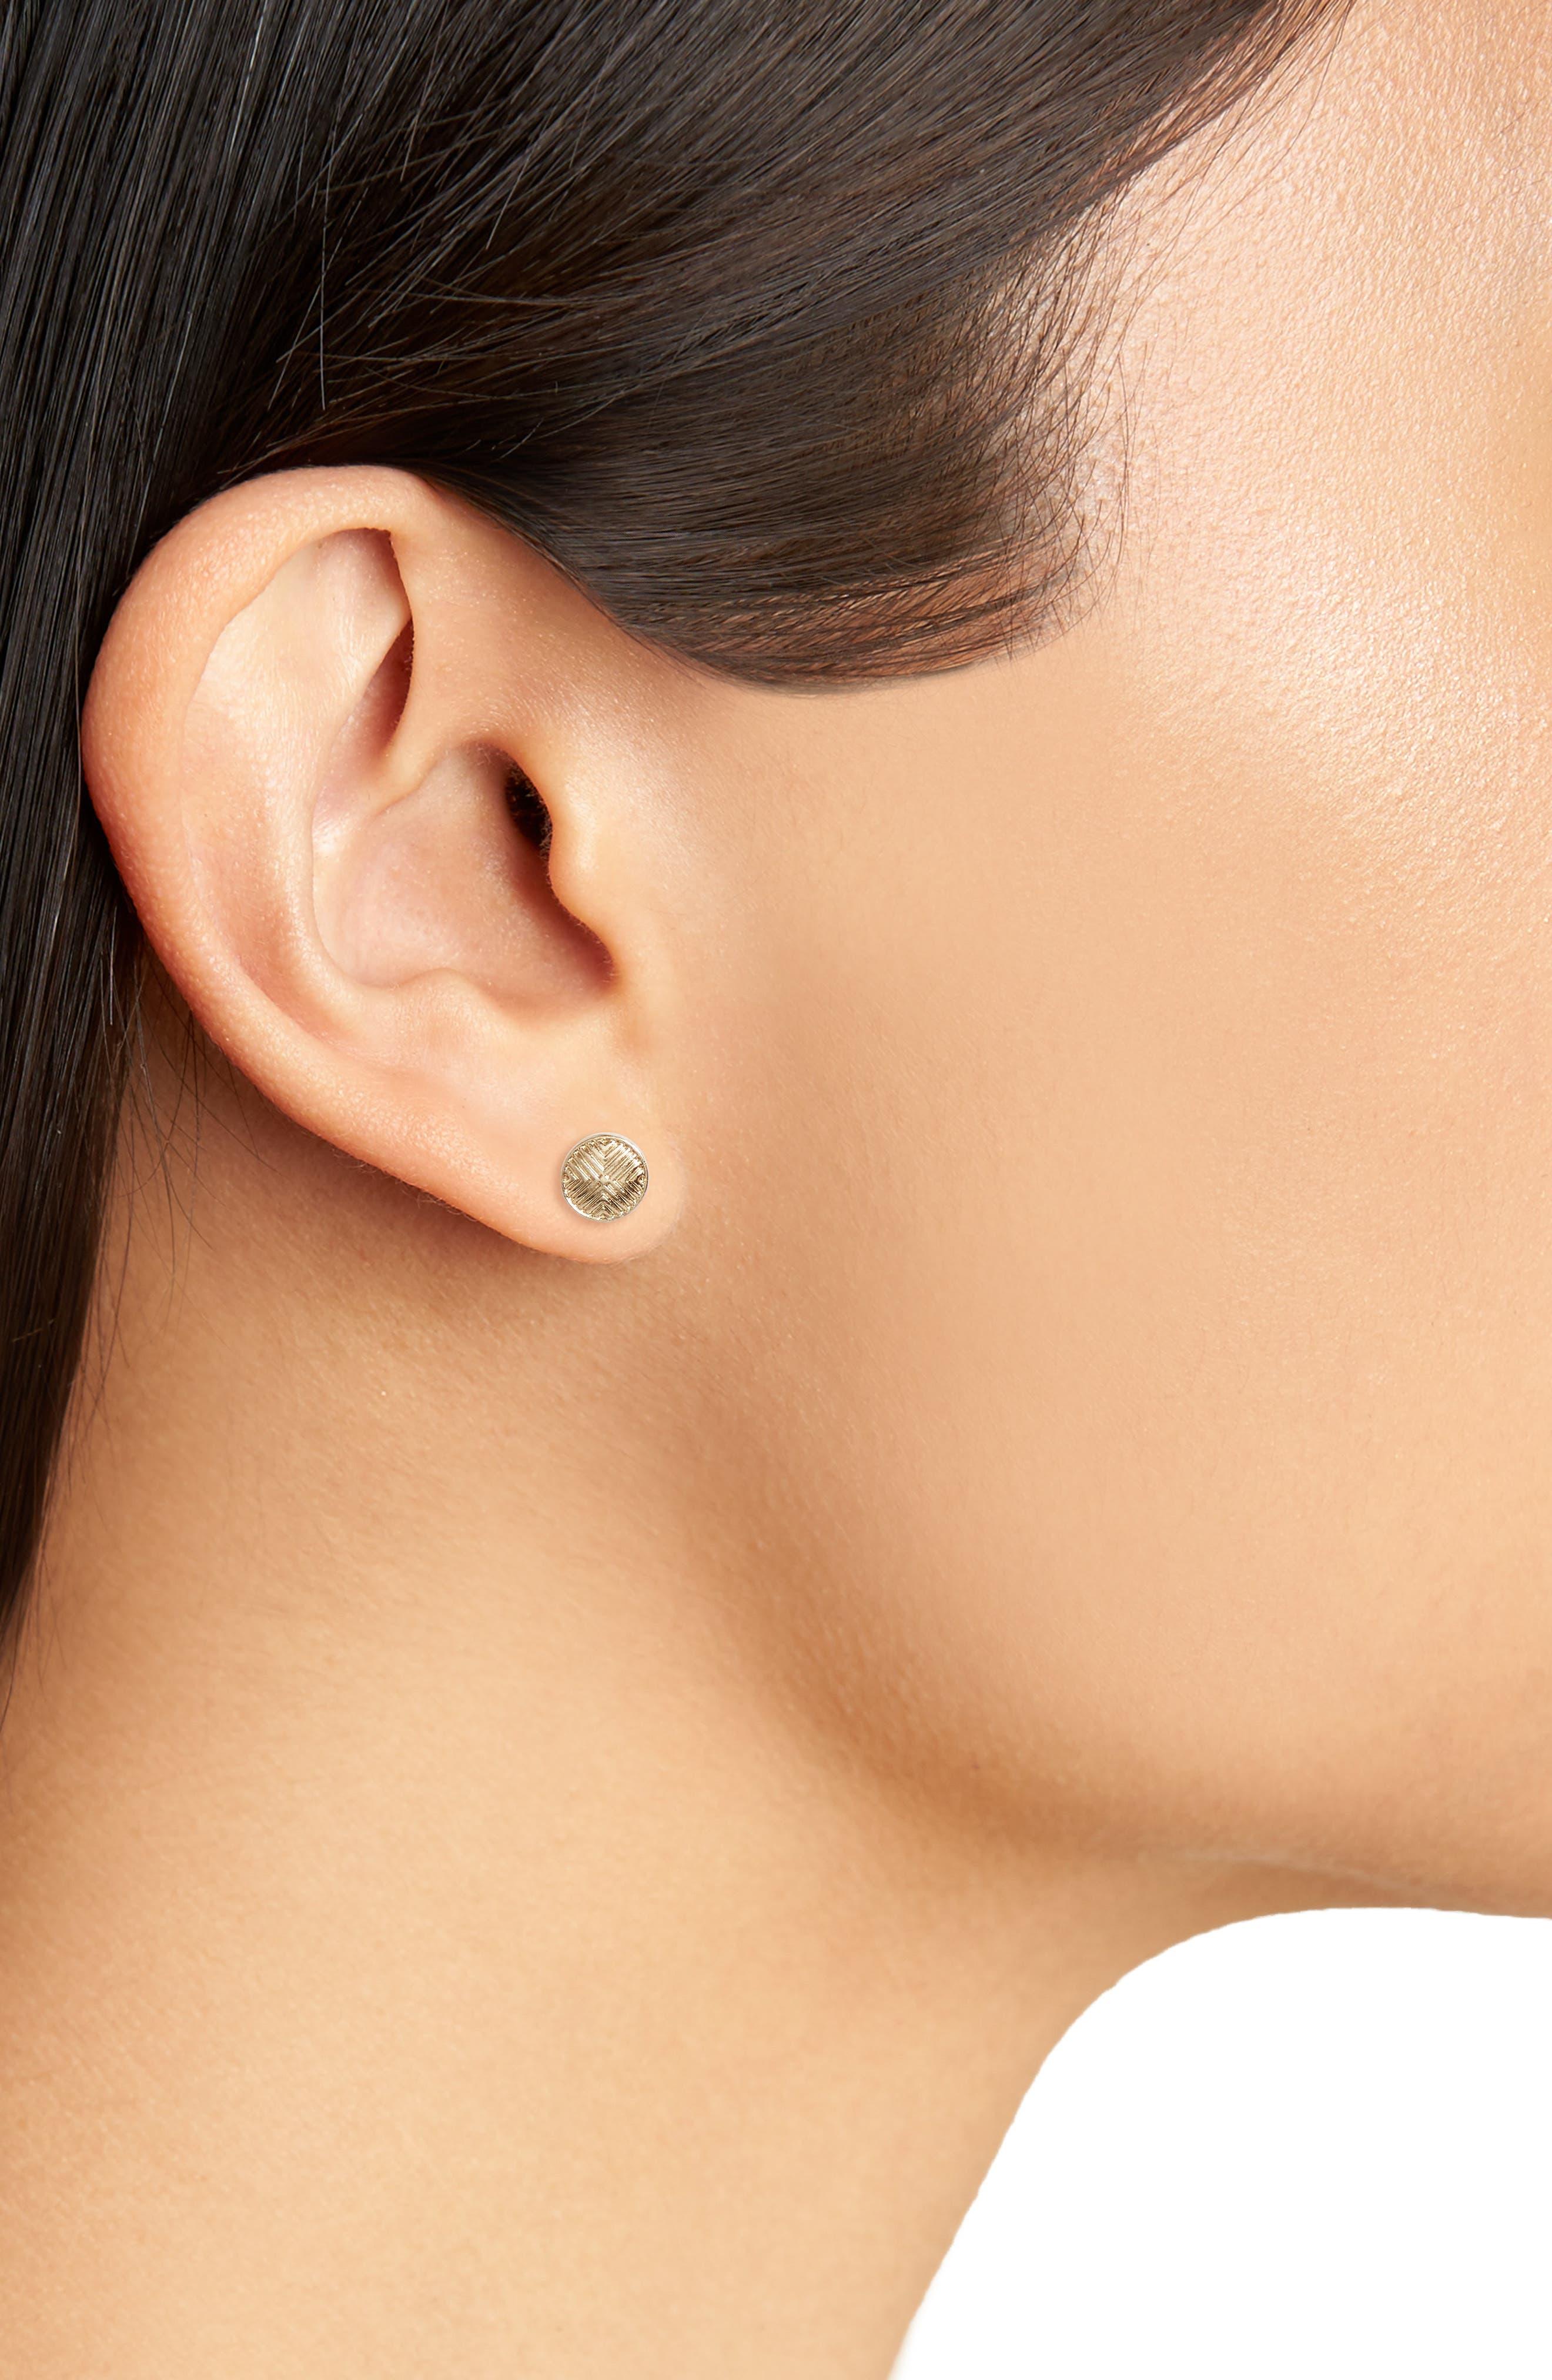 18-Pack Mixed Metal Earrings,                             Alternate thumbnail 2, color,                             710